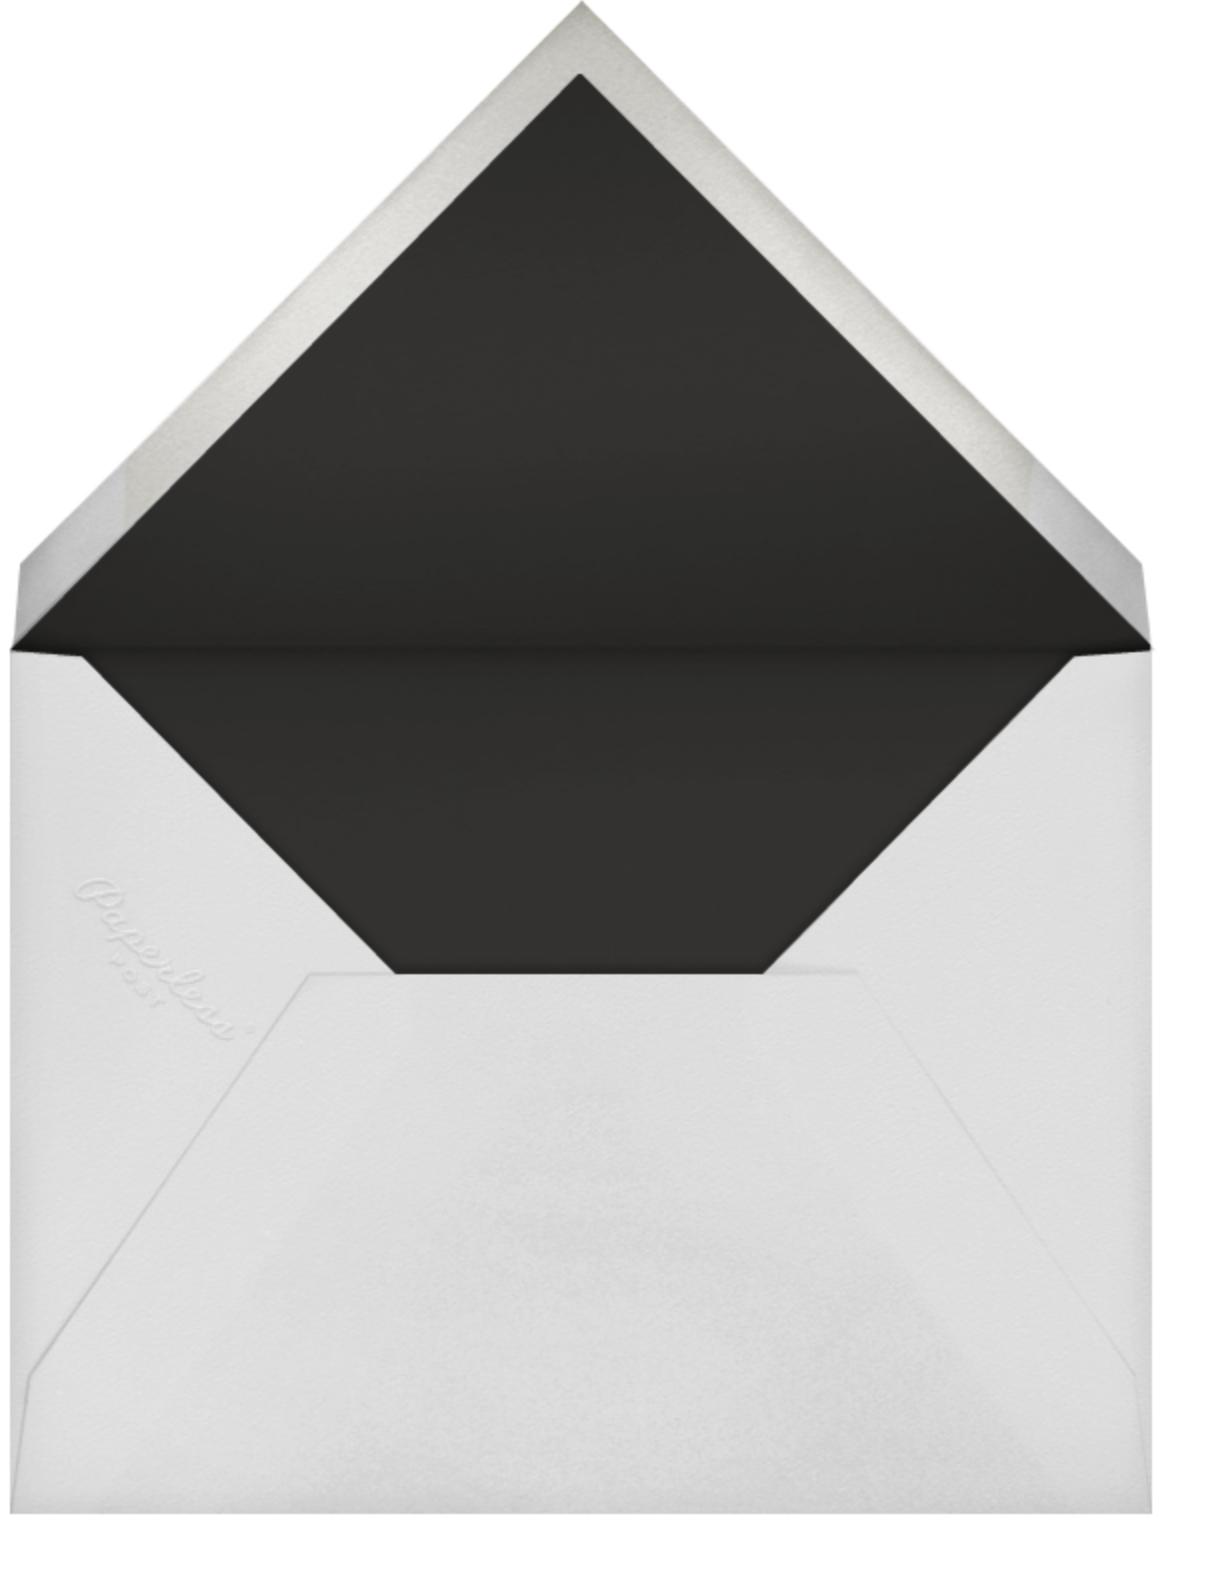 Gardenia (Stationery) - Black - Oscar de la Renta - Personalized stationery - envelope back